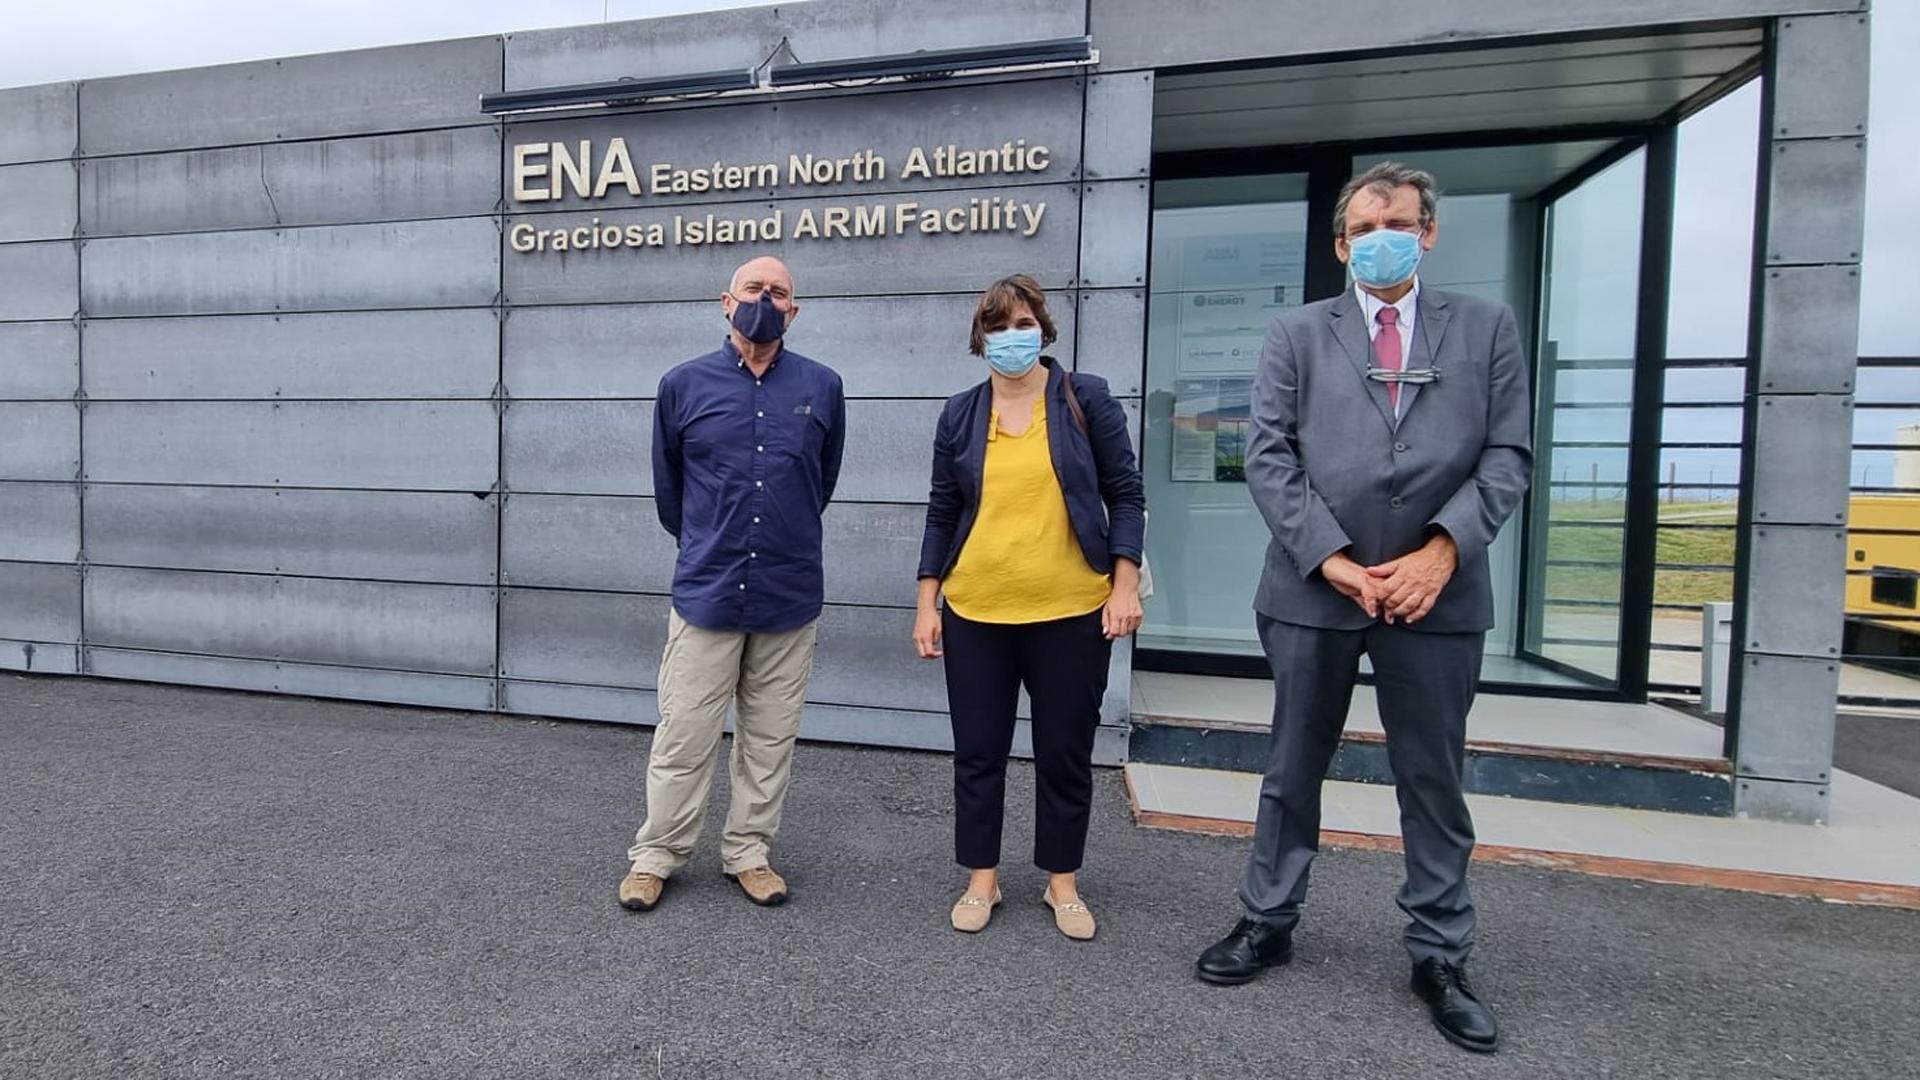 Visita à Eastern North Atlantic, Graciosa Island ARM Facility